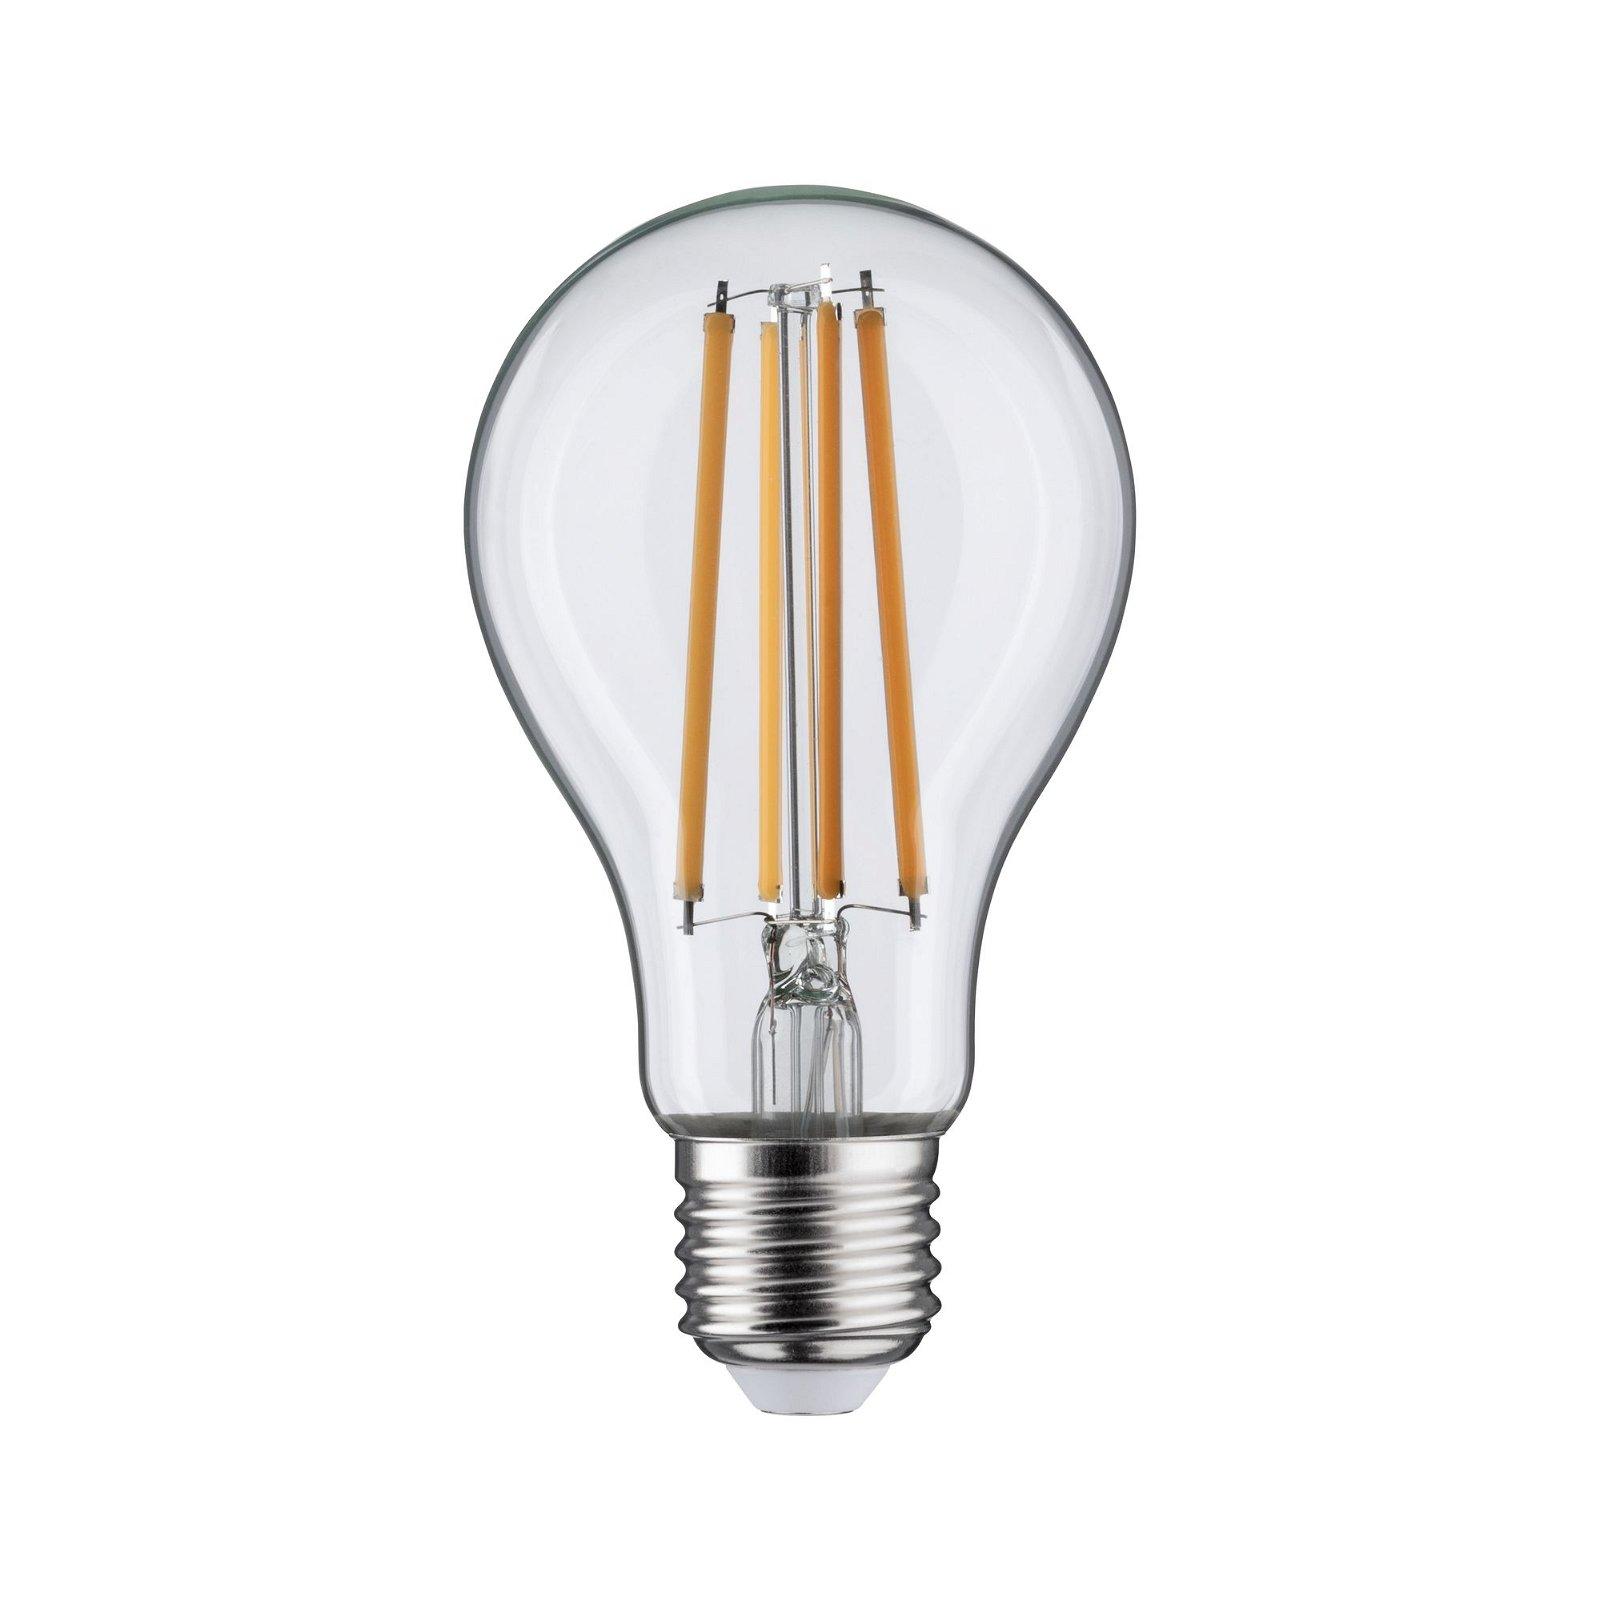 LED Birne Filament E27 230V 1521lm 12,5W 2700K Klar